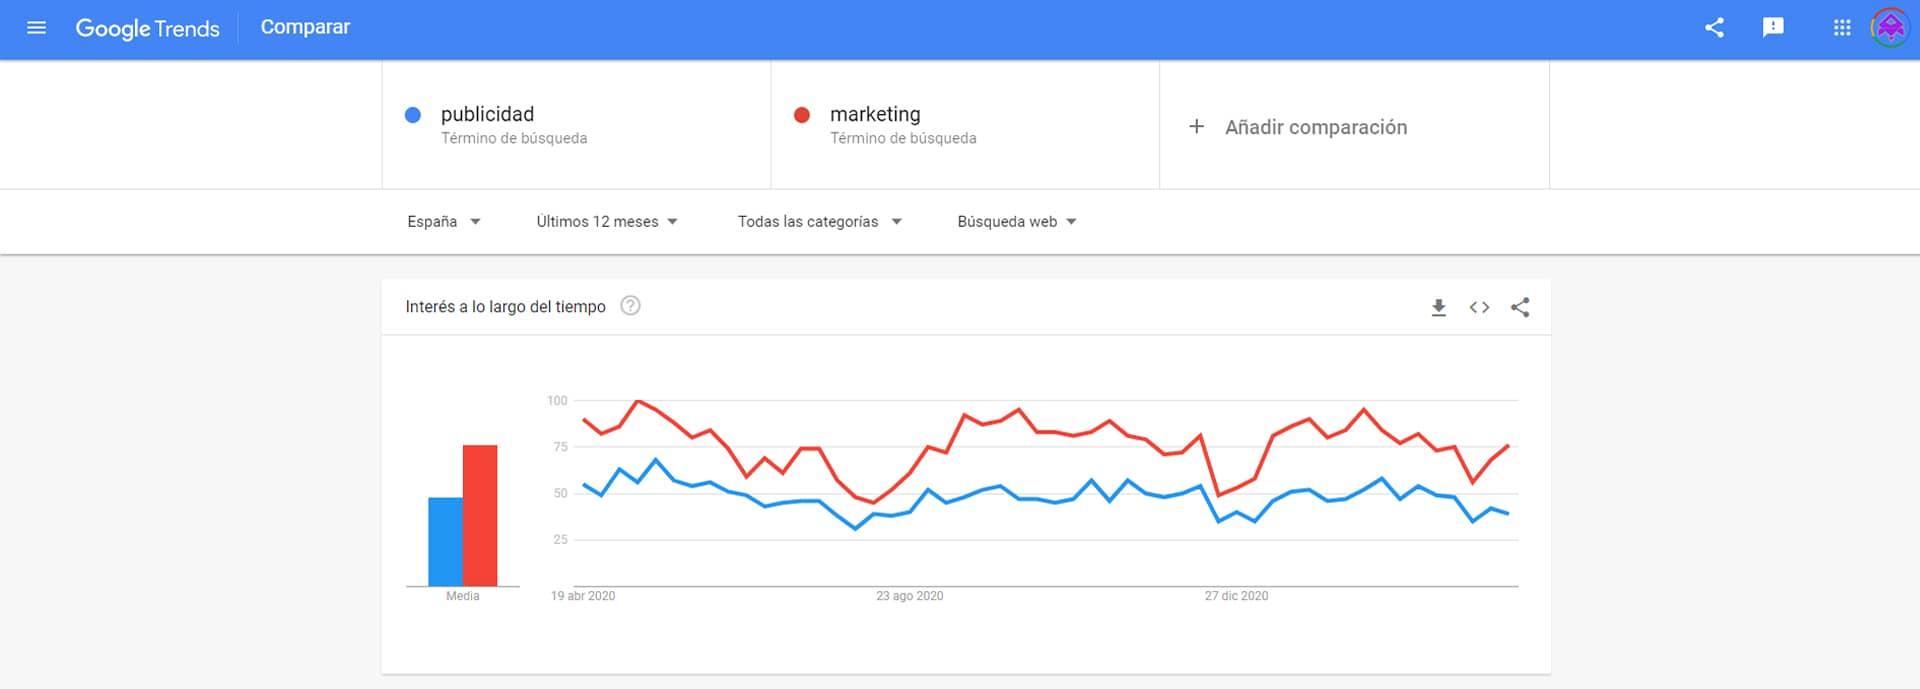 estadisticas Google Trends